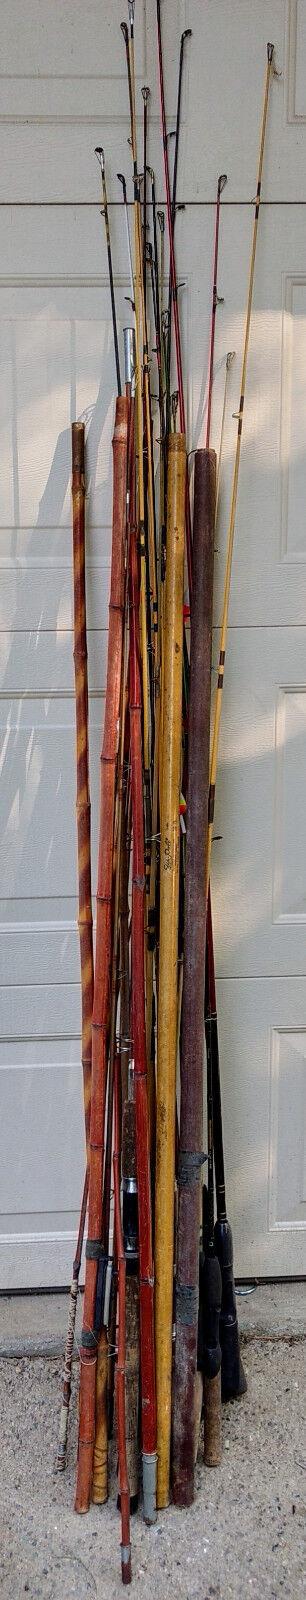 Huge Vintage Fishing Pole Rod Collection Estate LOT South Bend Berkley Shimano